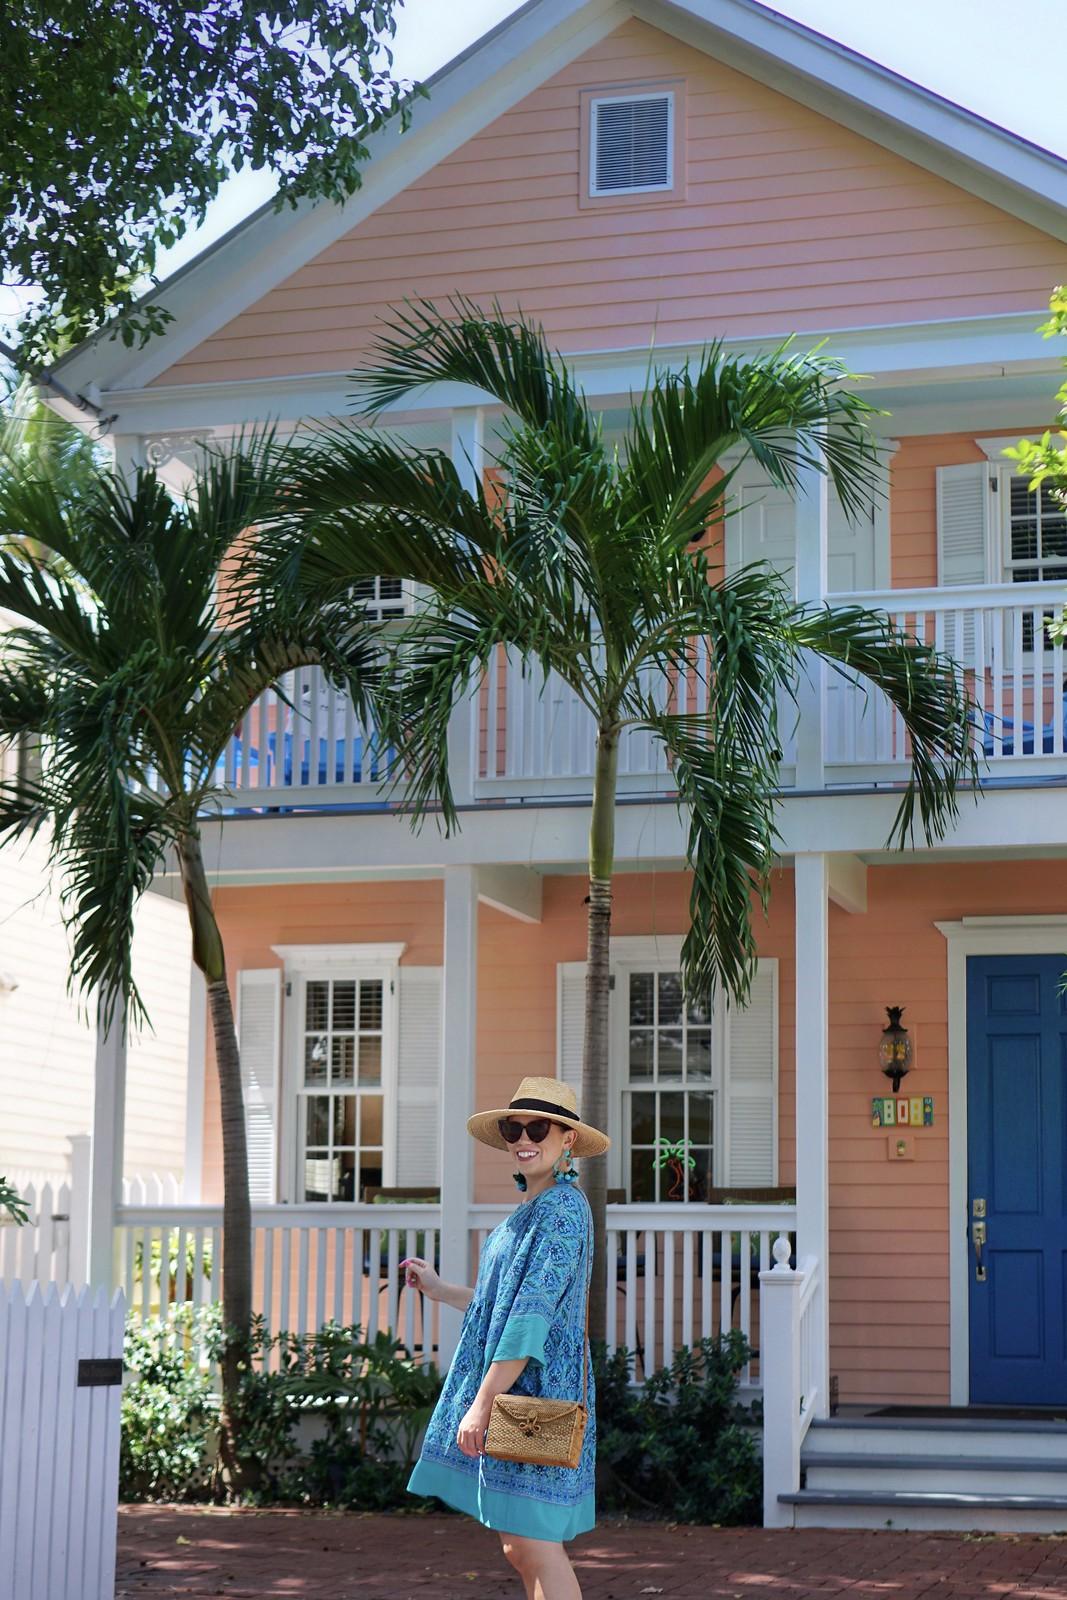 ultimate-road-trip-5-days-florida-keys-itinerary-what-to-do-key-west-key-largo-islamorada-marathon-miami-vacation-guide